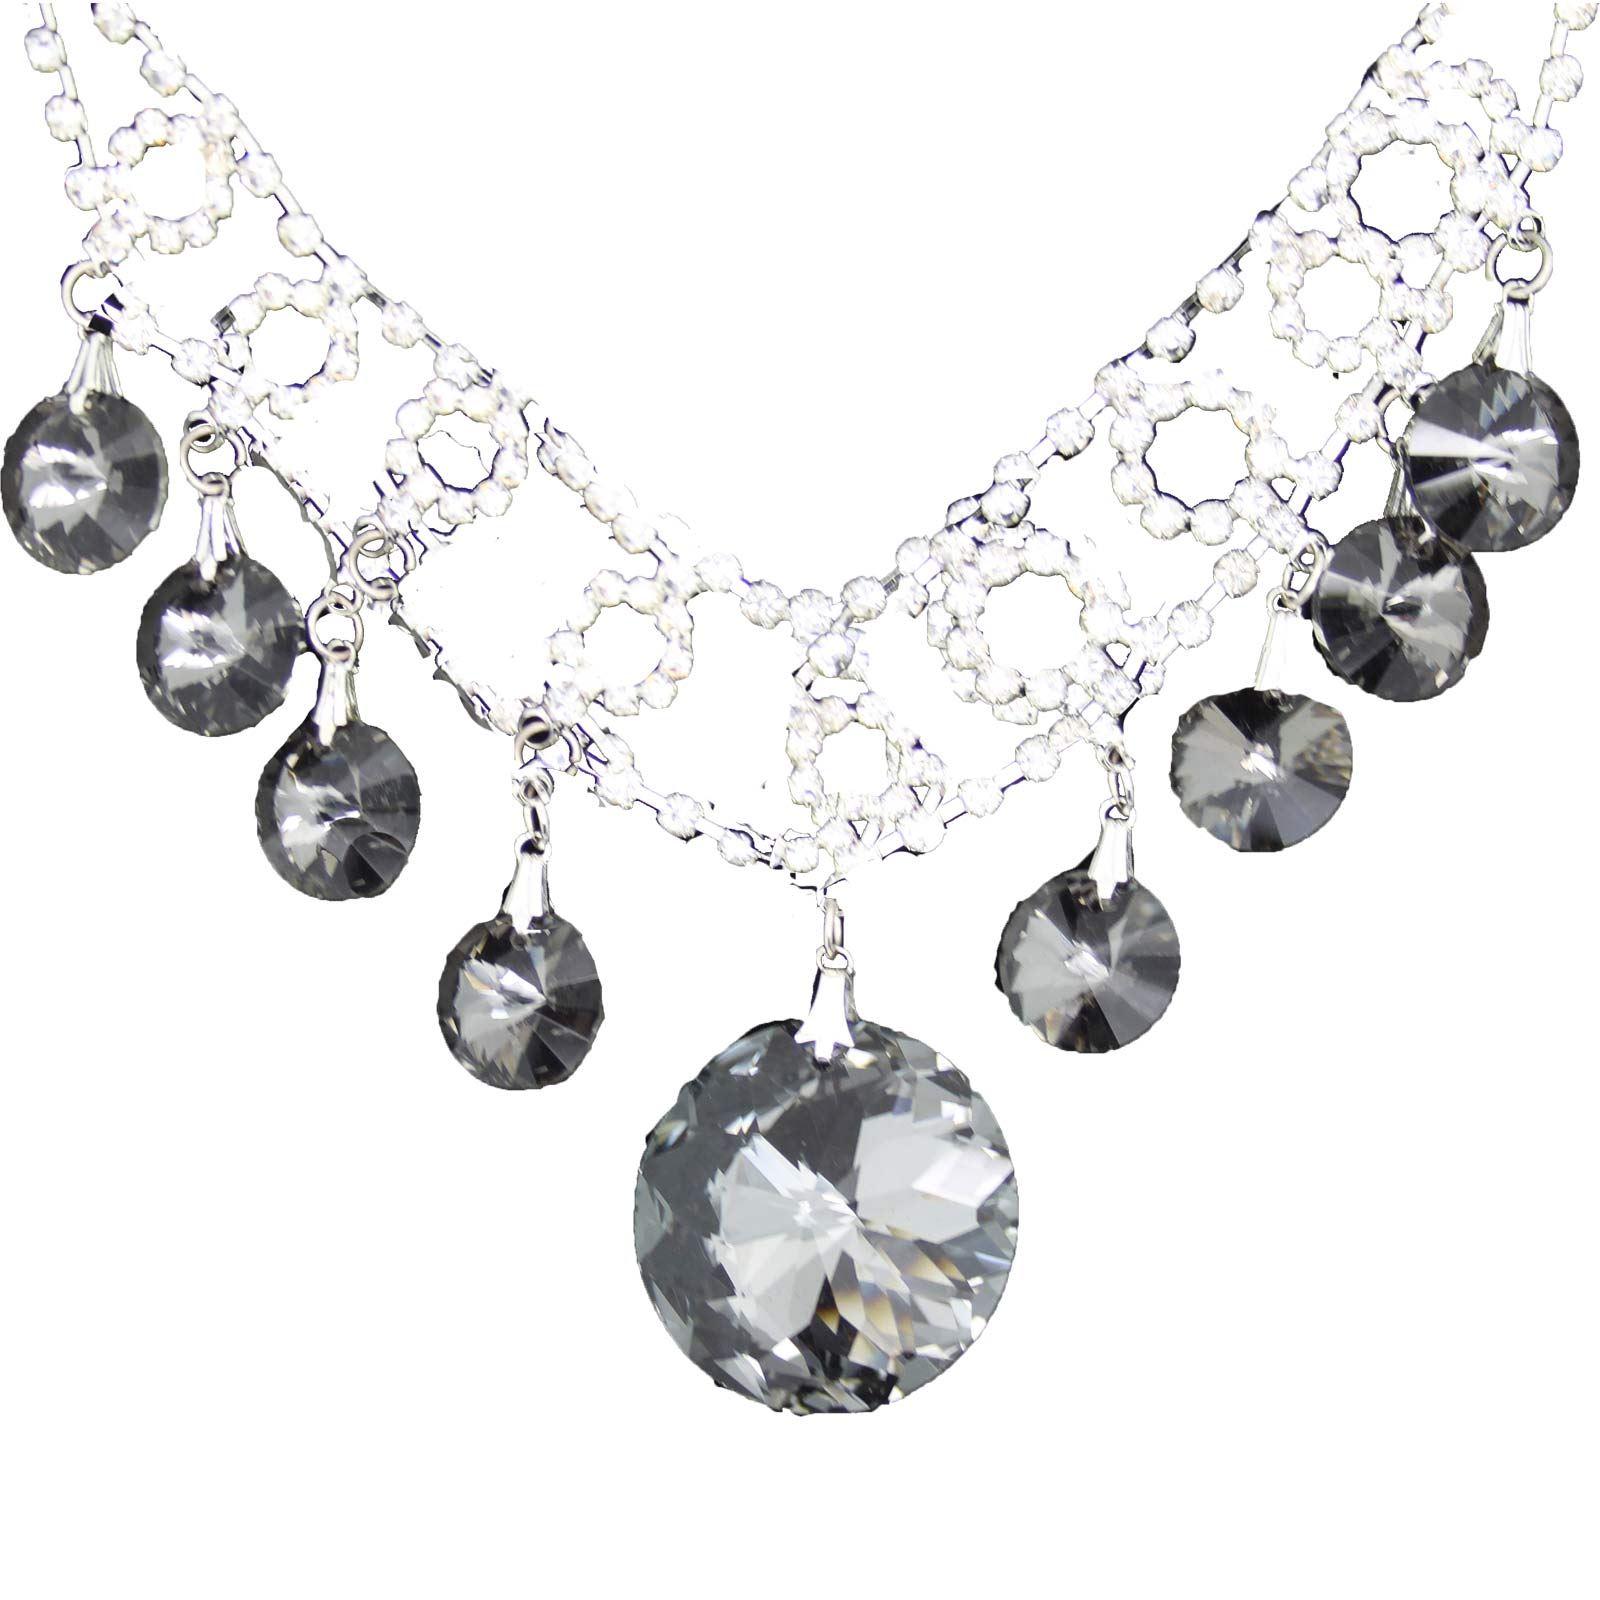 True-Face-Ladies-Women-039-s-Elegant-Earrings-Necklace-Set-Metal-Alloy-Jewellery thumbnail 13